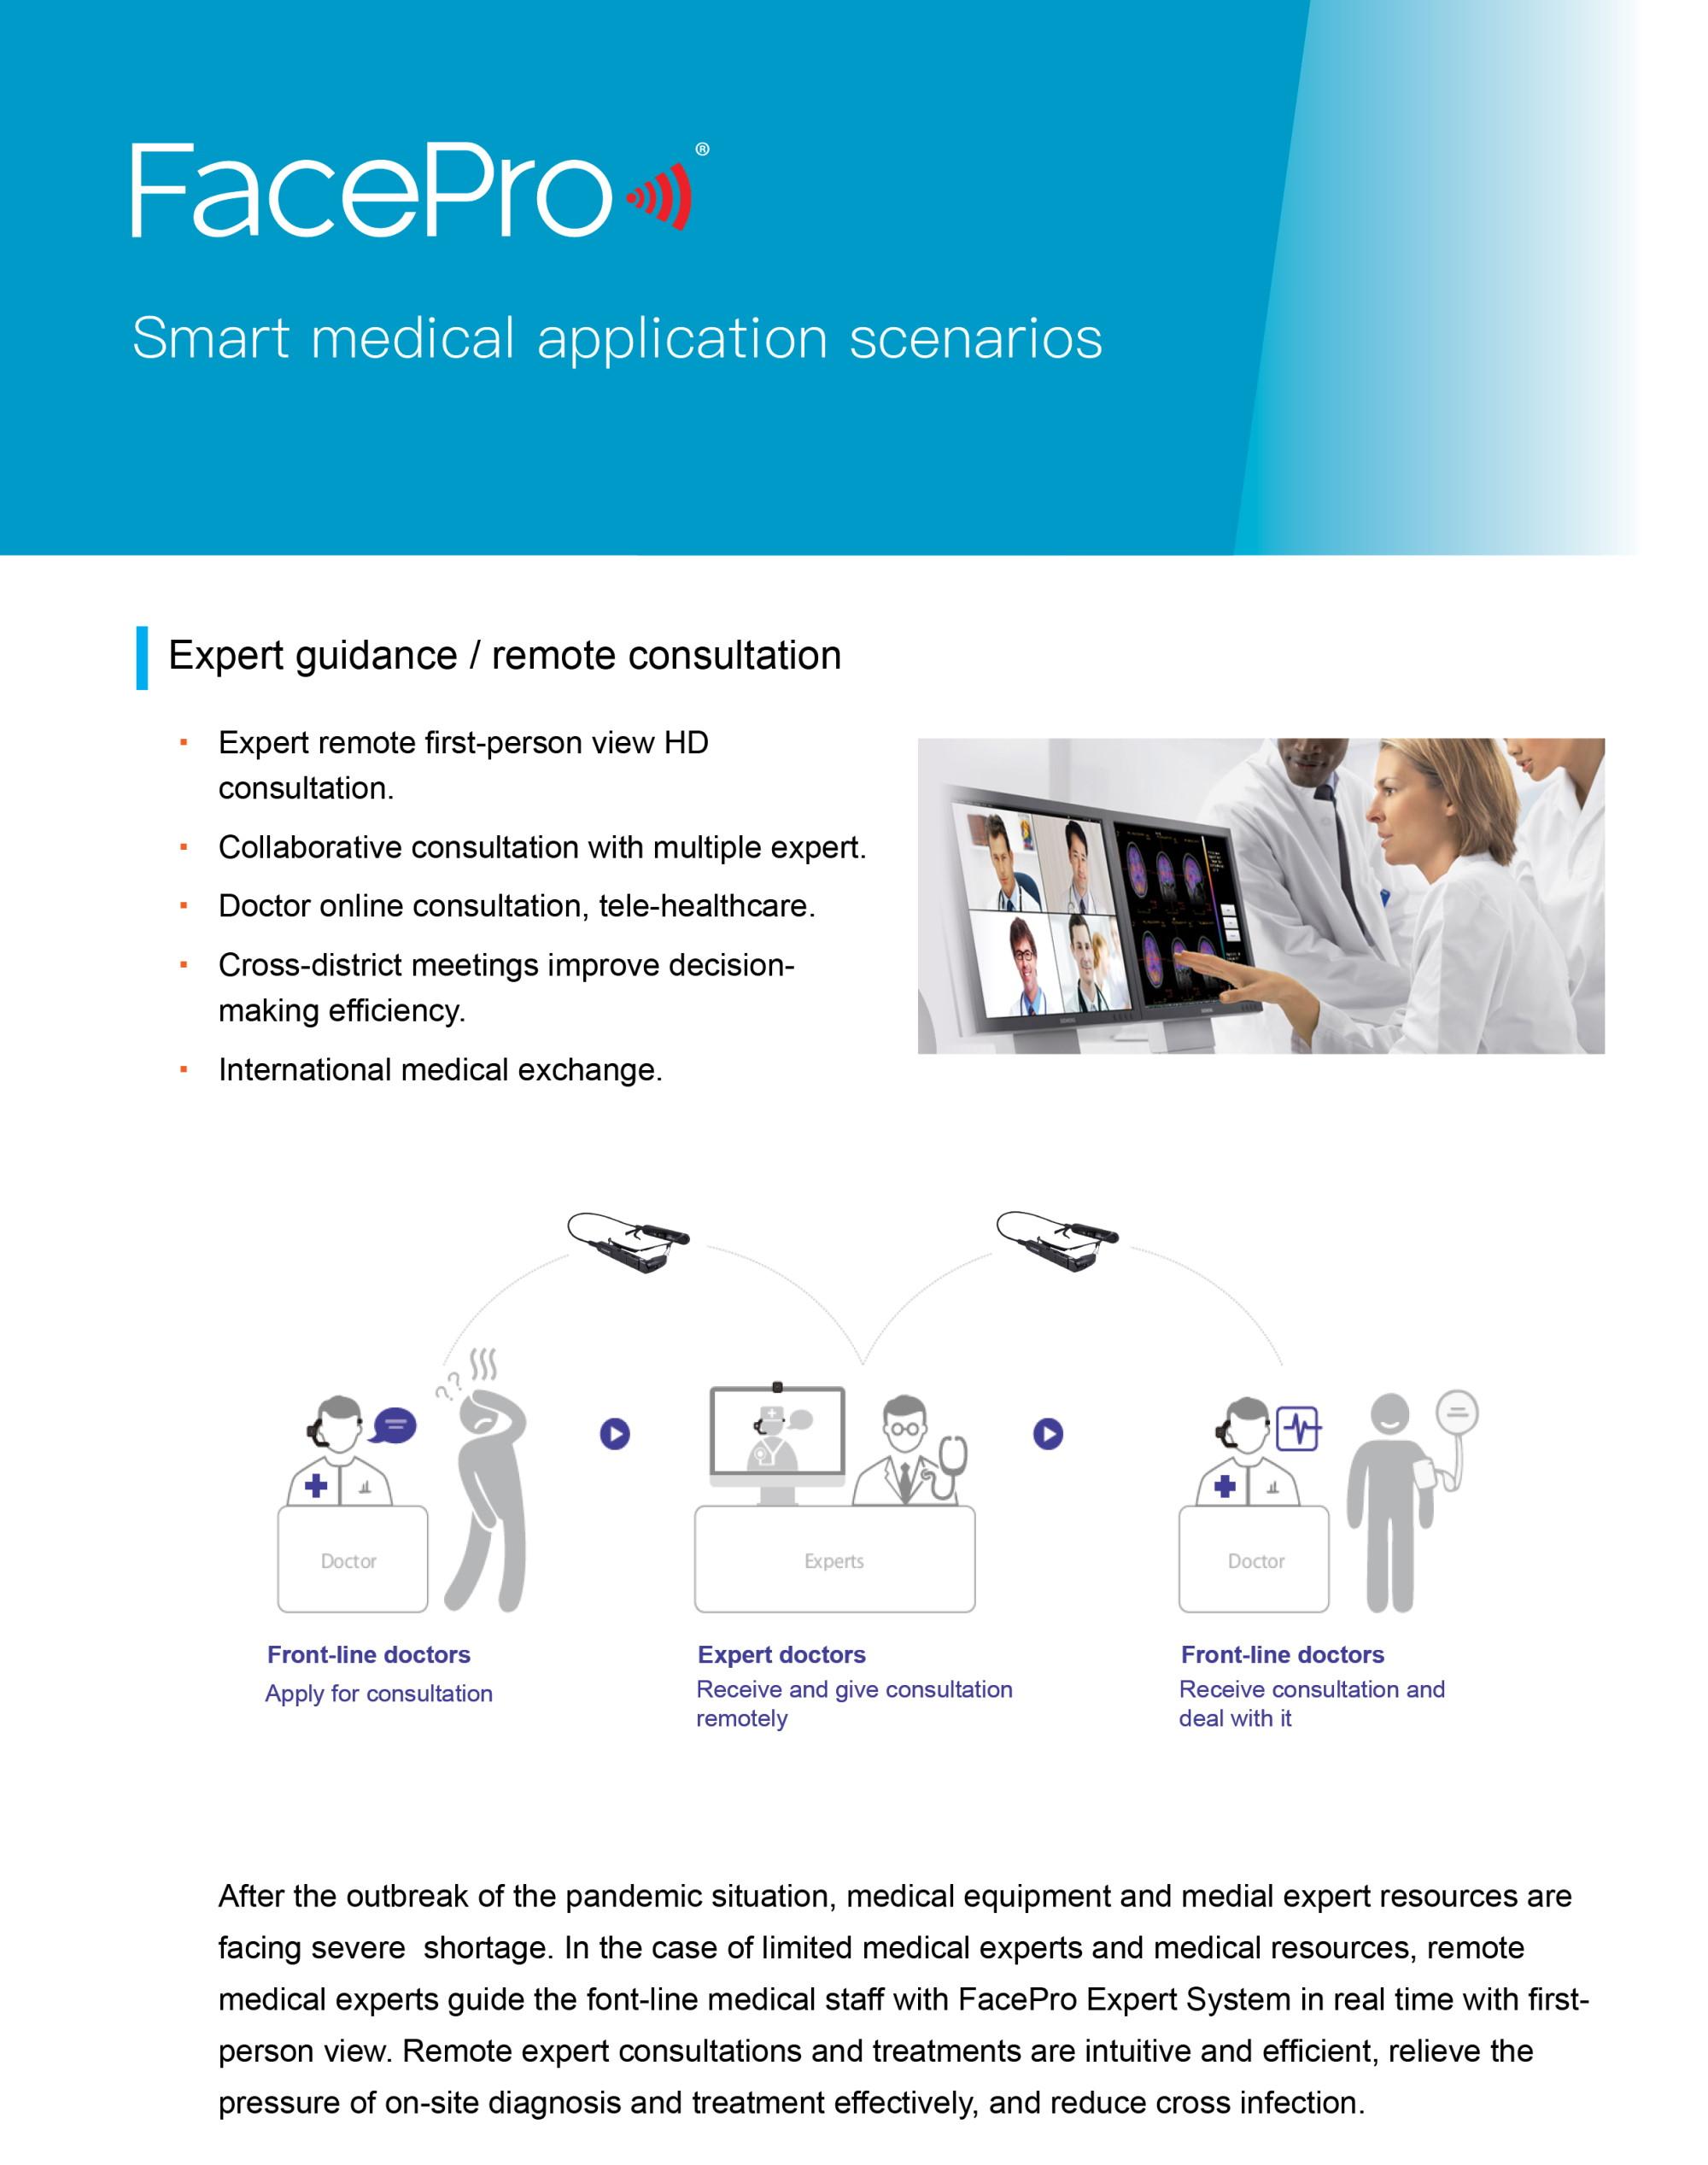 FacePro Xpert System Telemedicine Solution